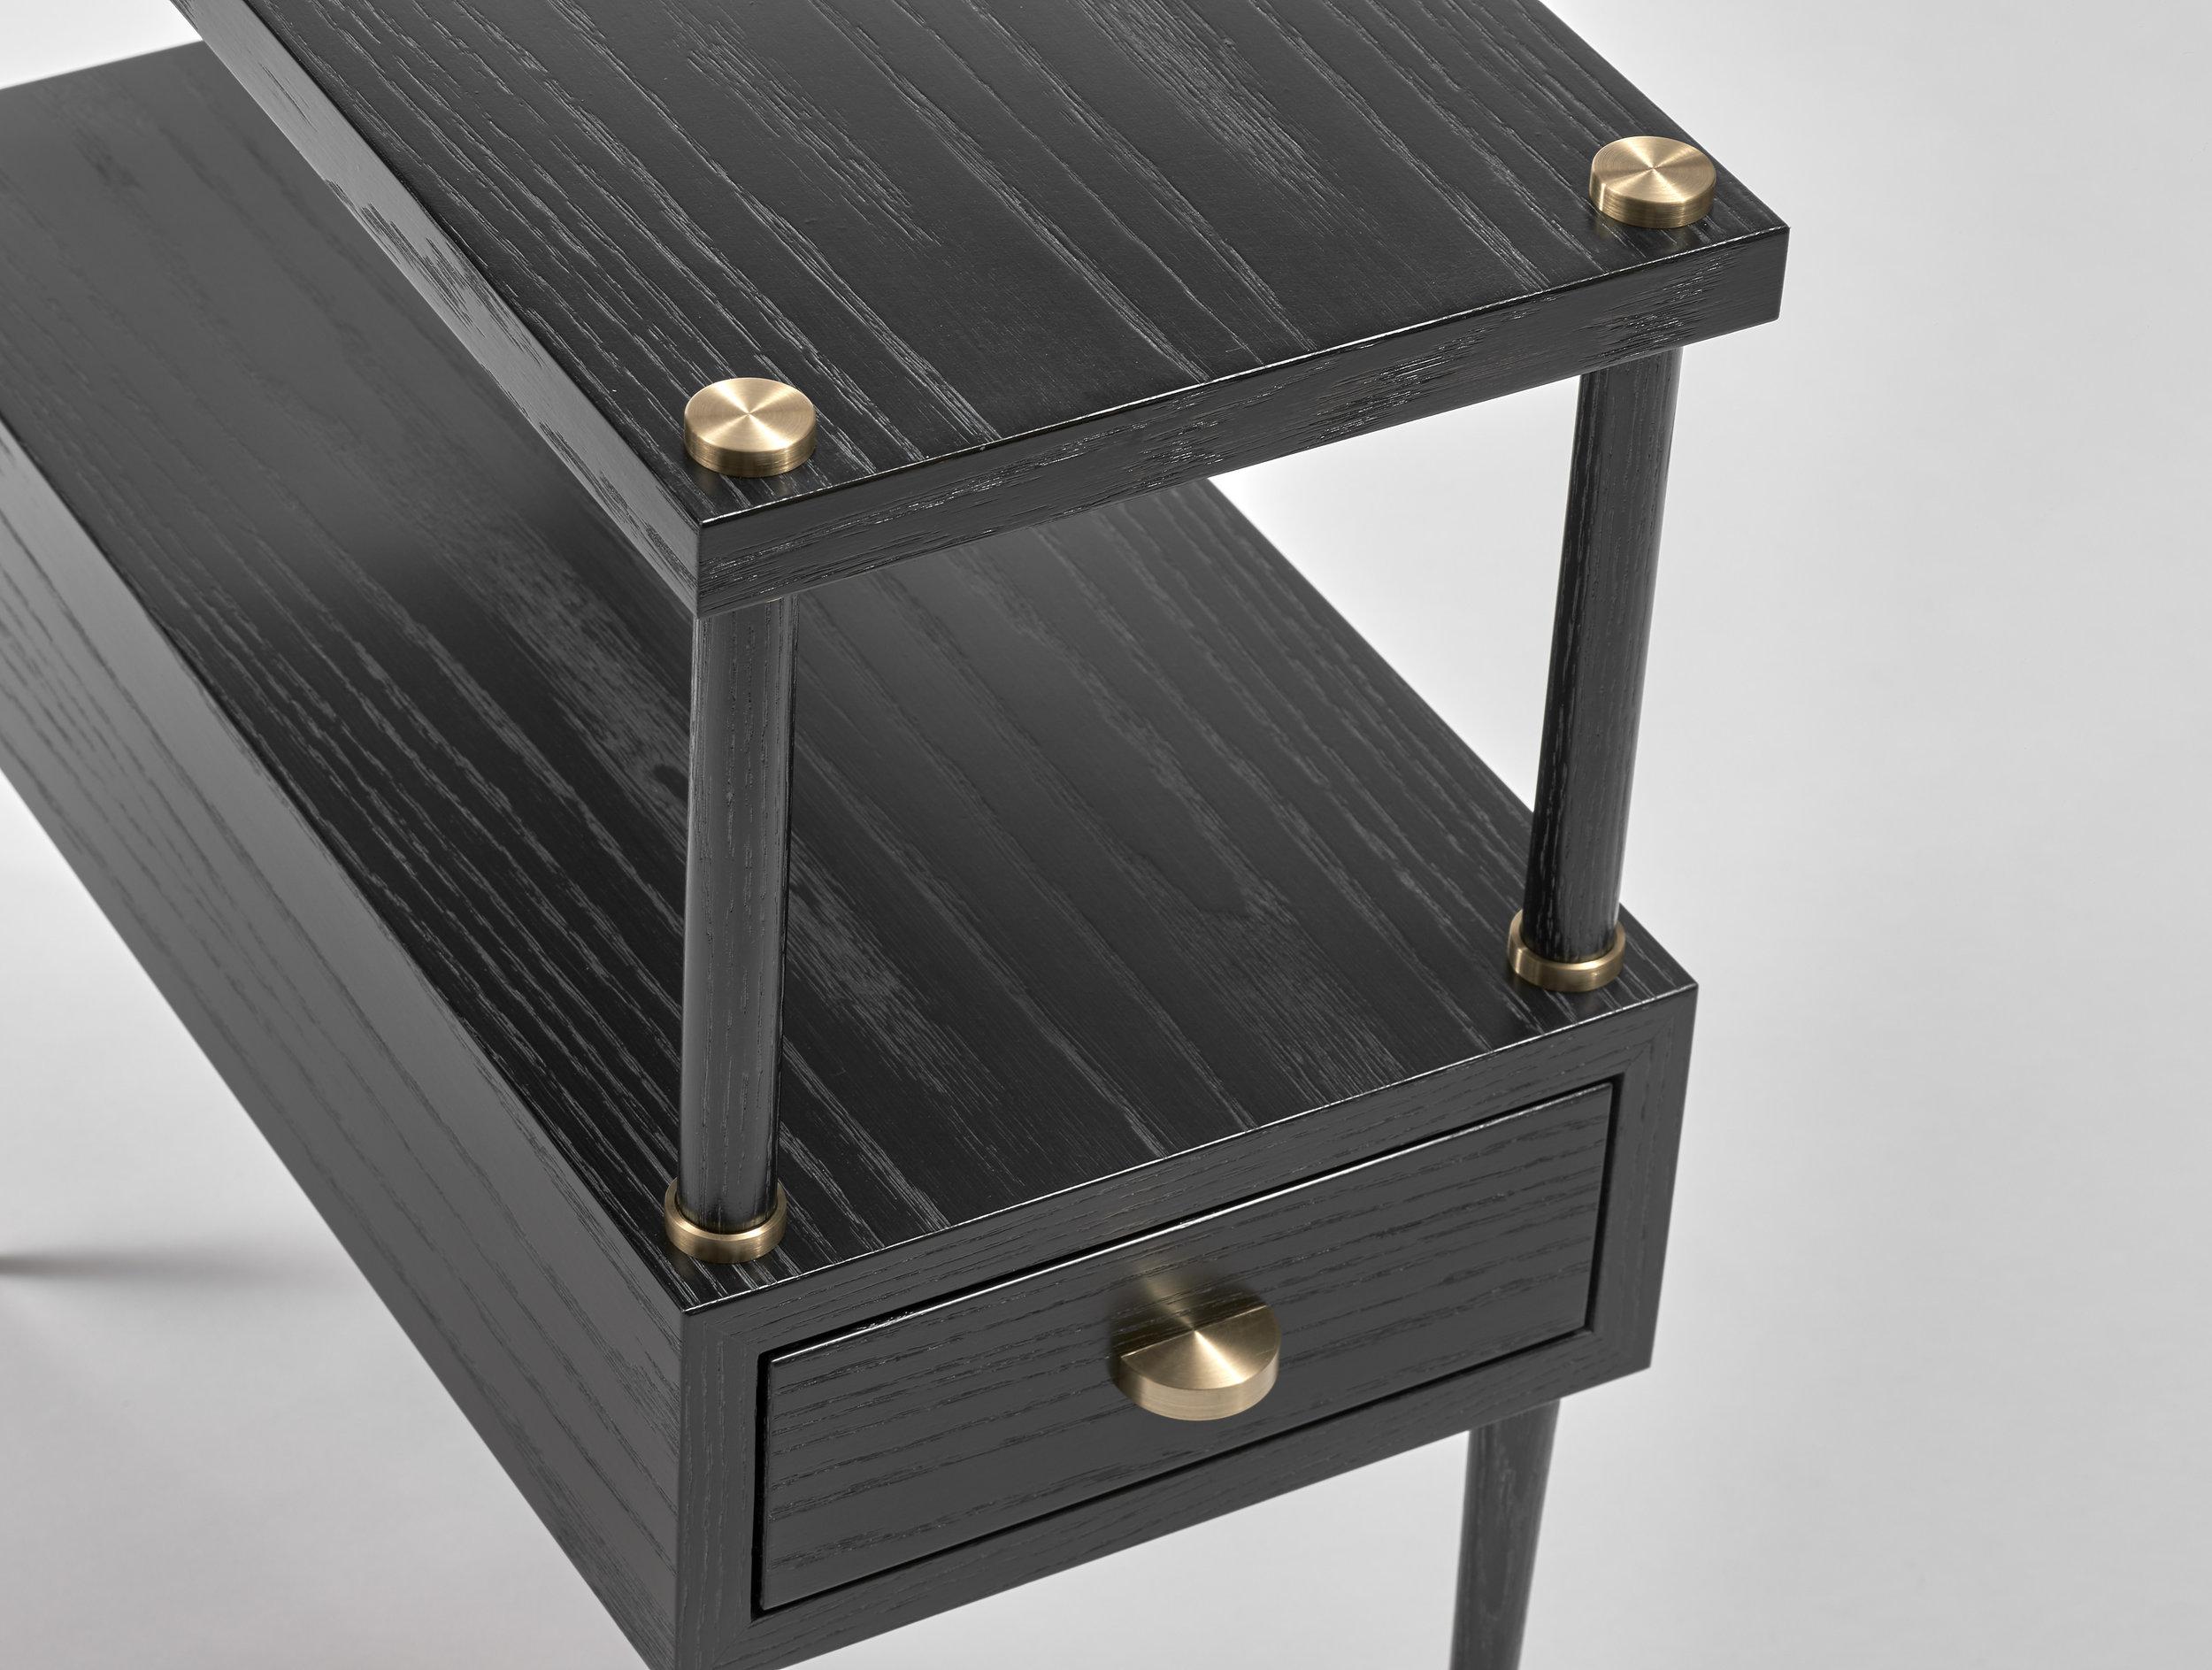 Dexter Table2.jpg